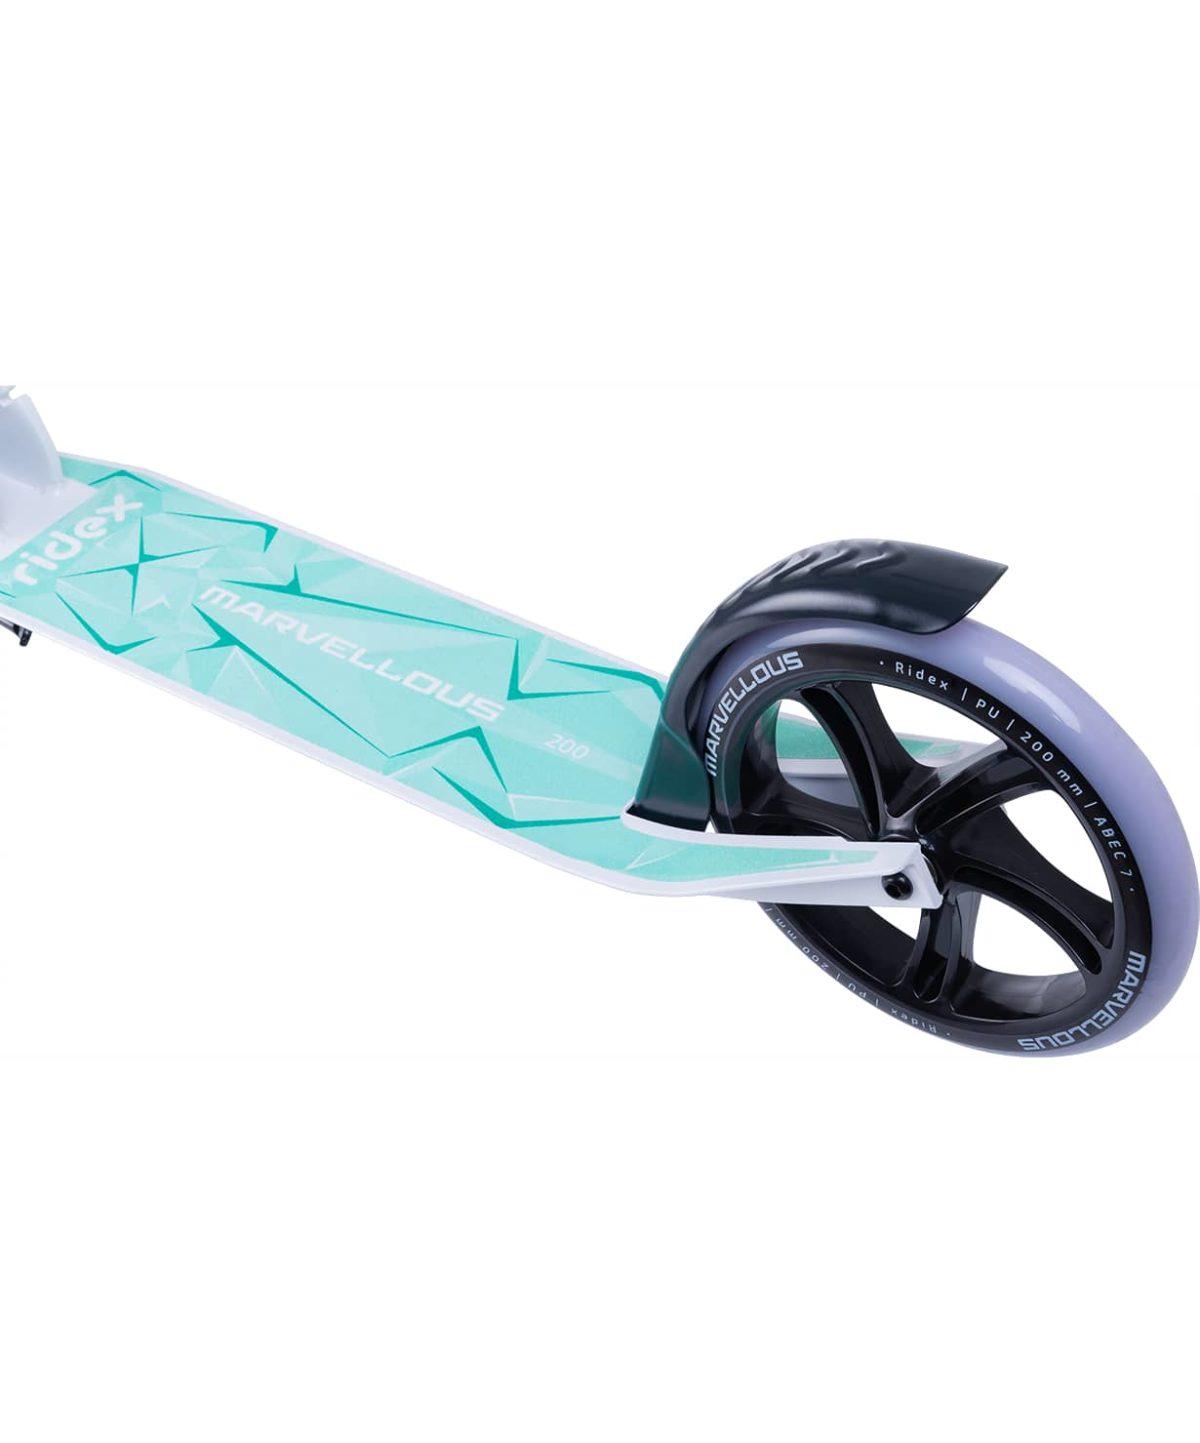 RIDEX Marvellous Самокат 2-х колес. 200 мм  Marvellous: белый/мятный - 6